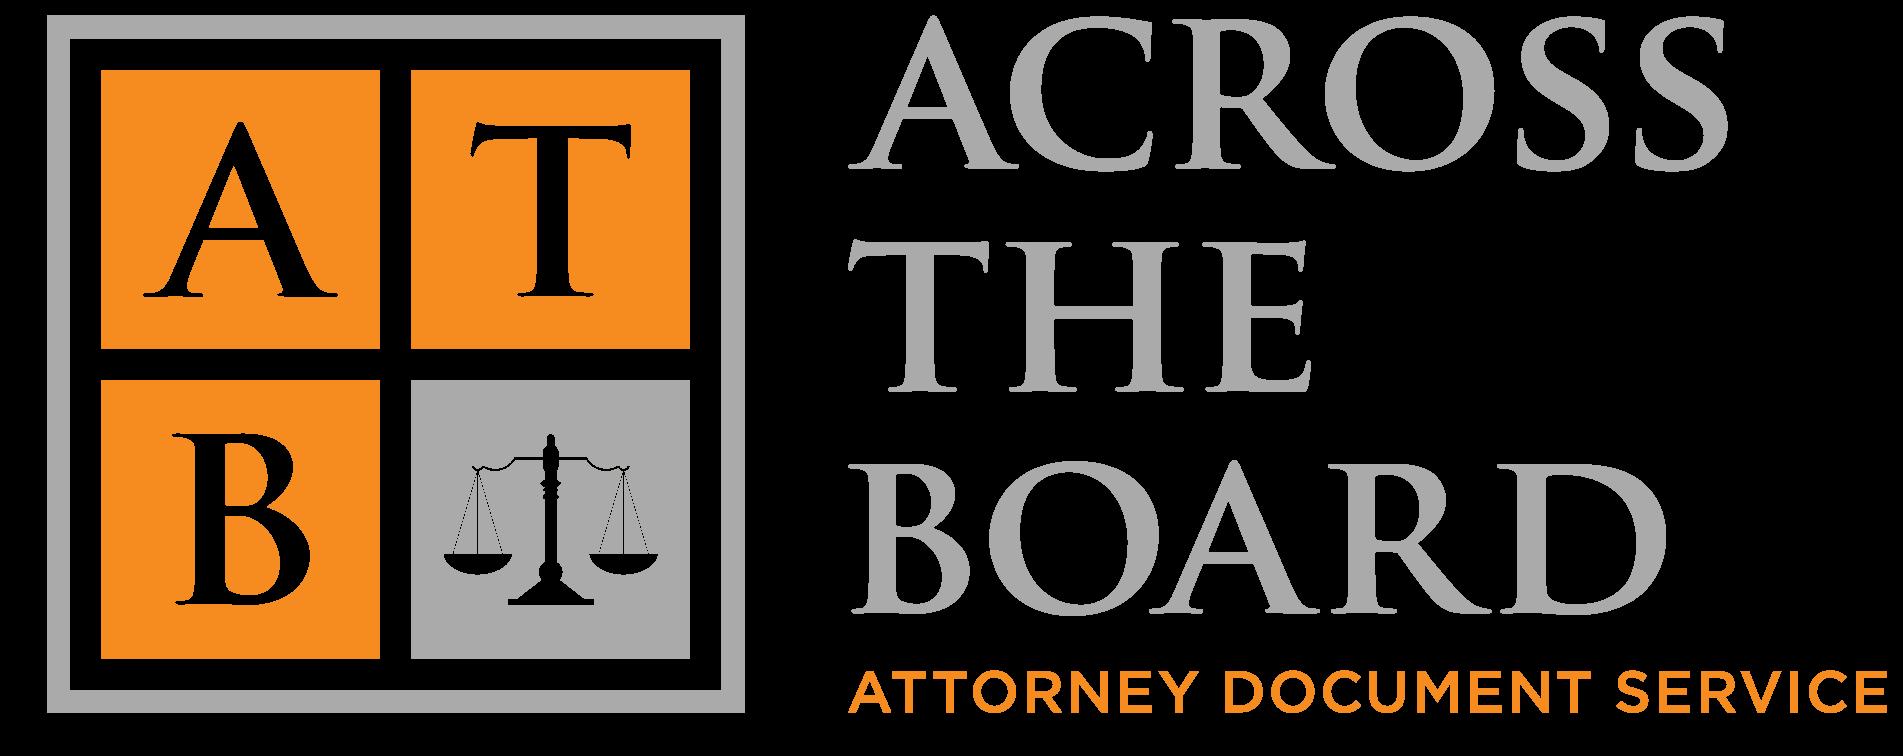 DAcross The Board Document Service